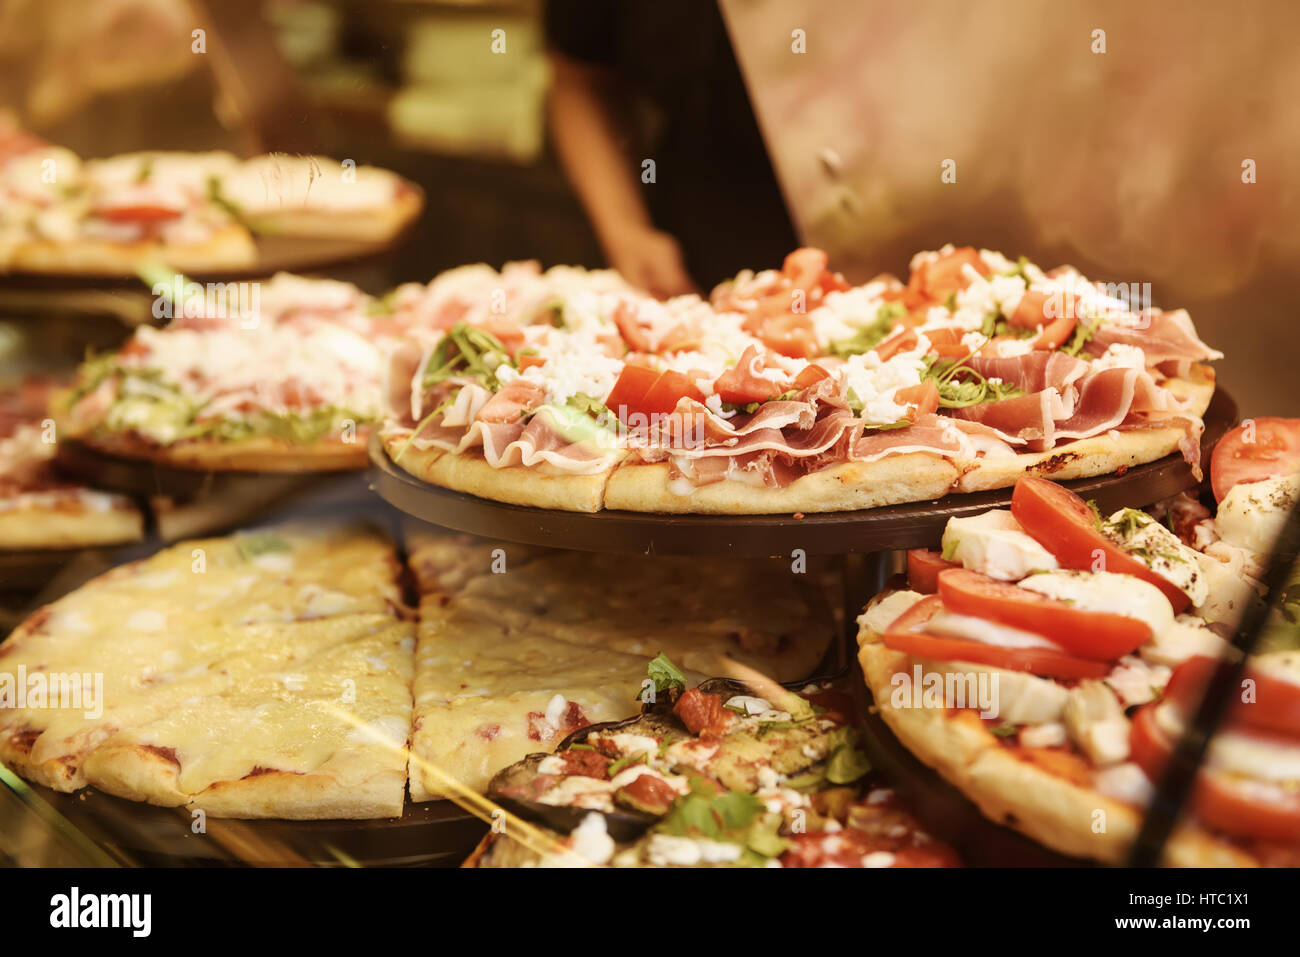 Pizza Shop Window Stock Photos & Pizza Shop Window Stock Images - Alamy